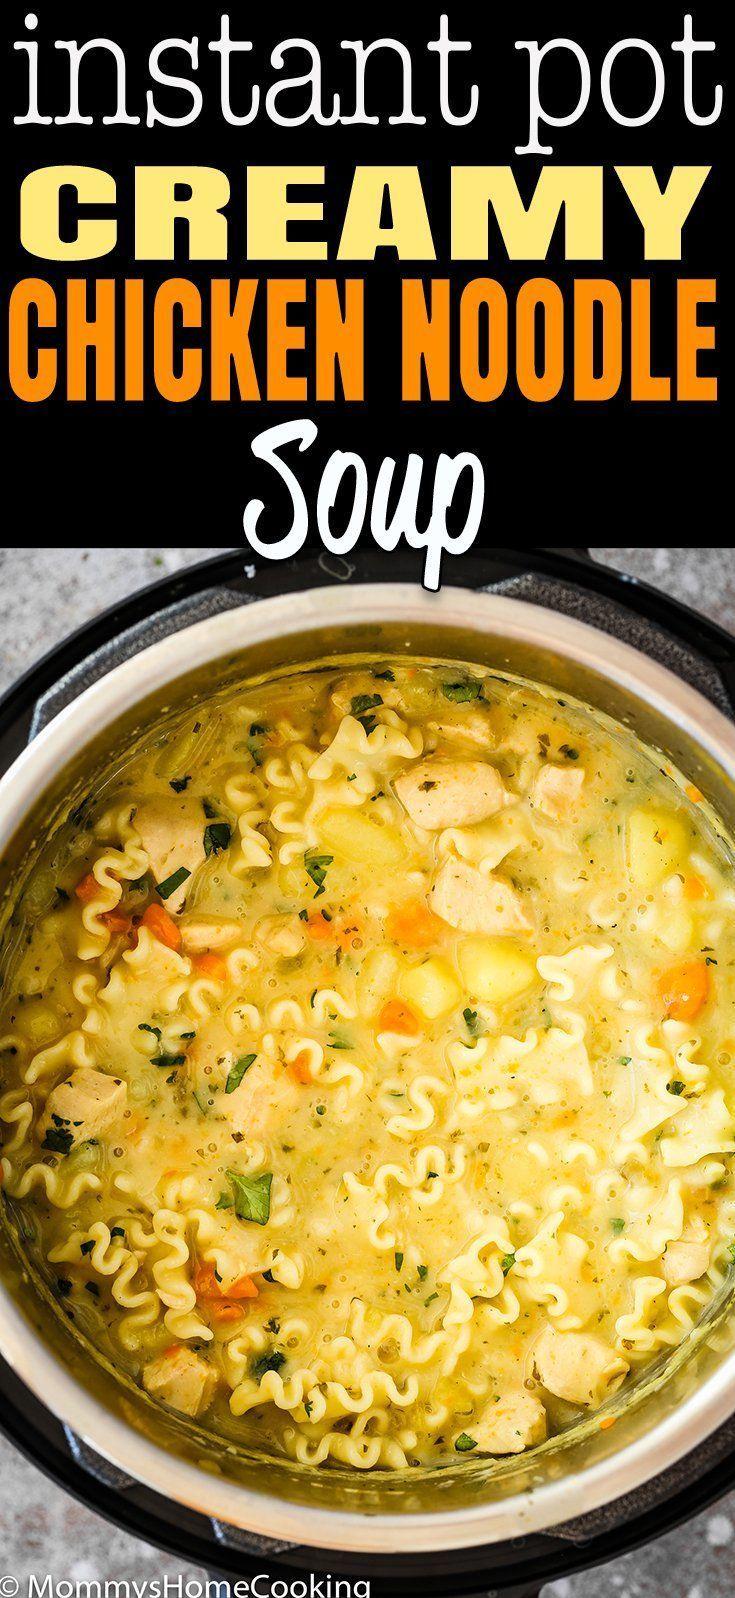 Pressure Cooker Creamy Chicken Noodle Soup [Video]